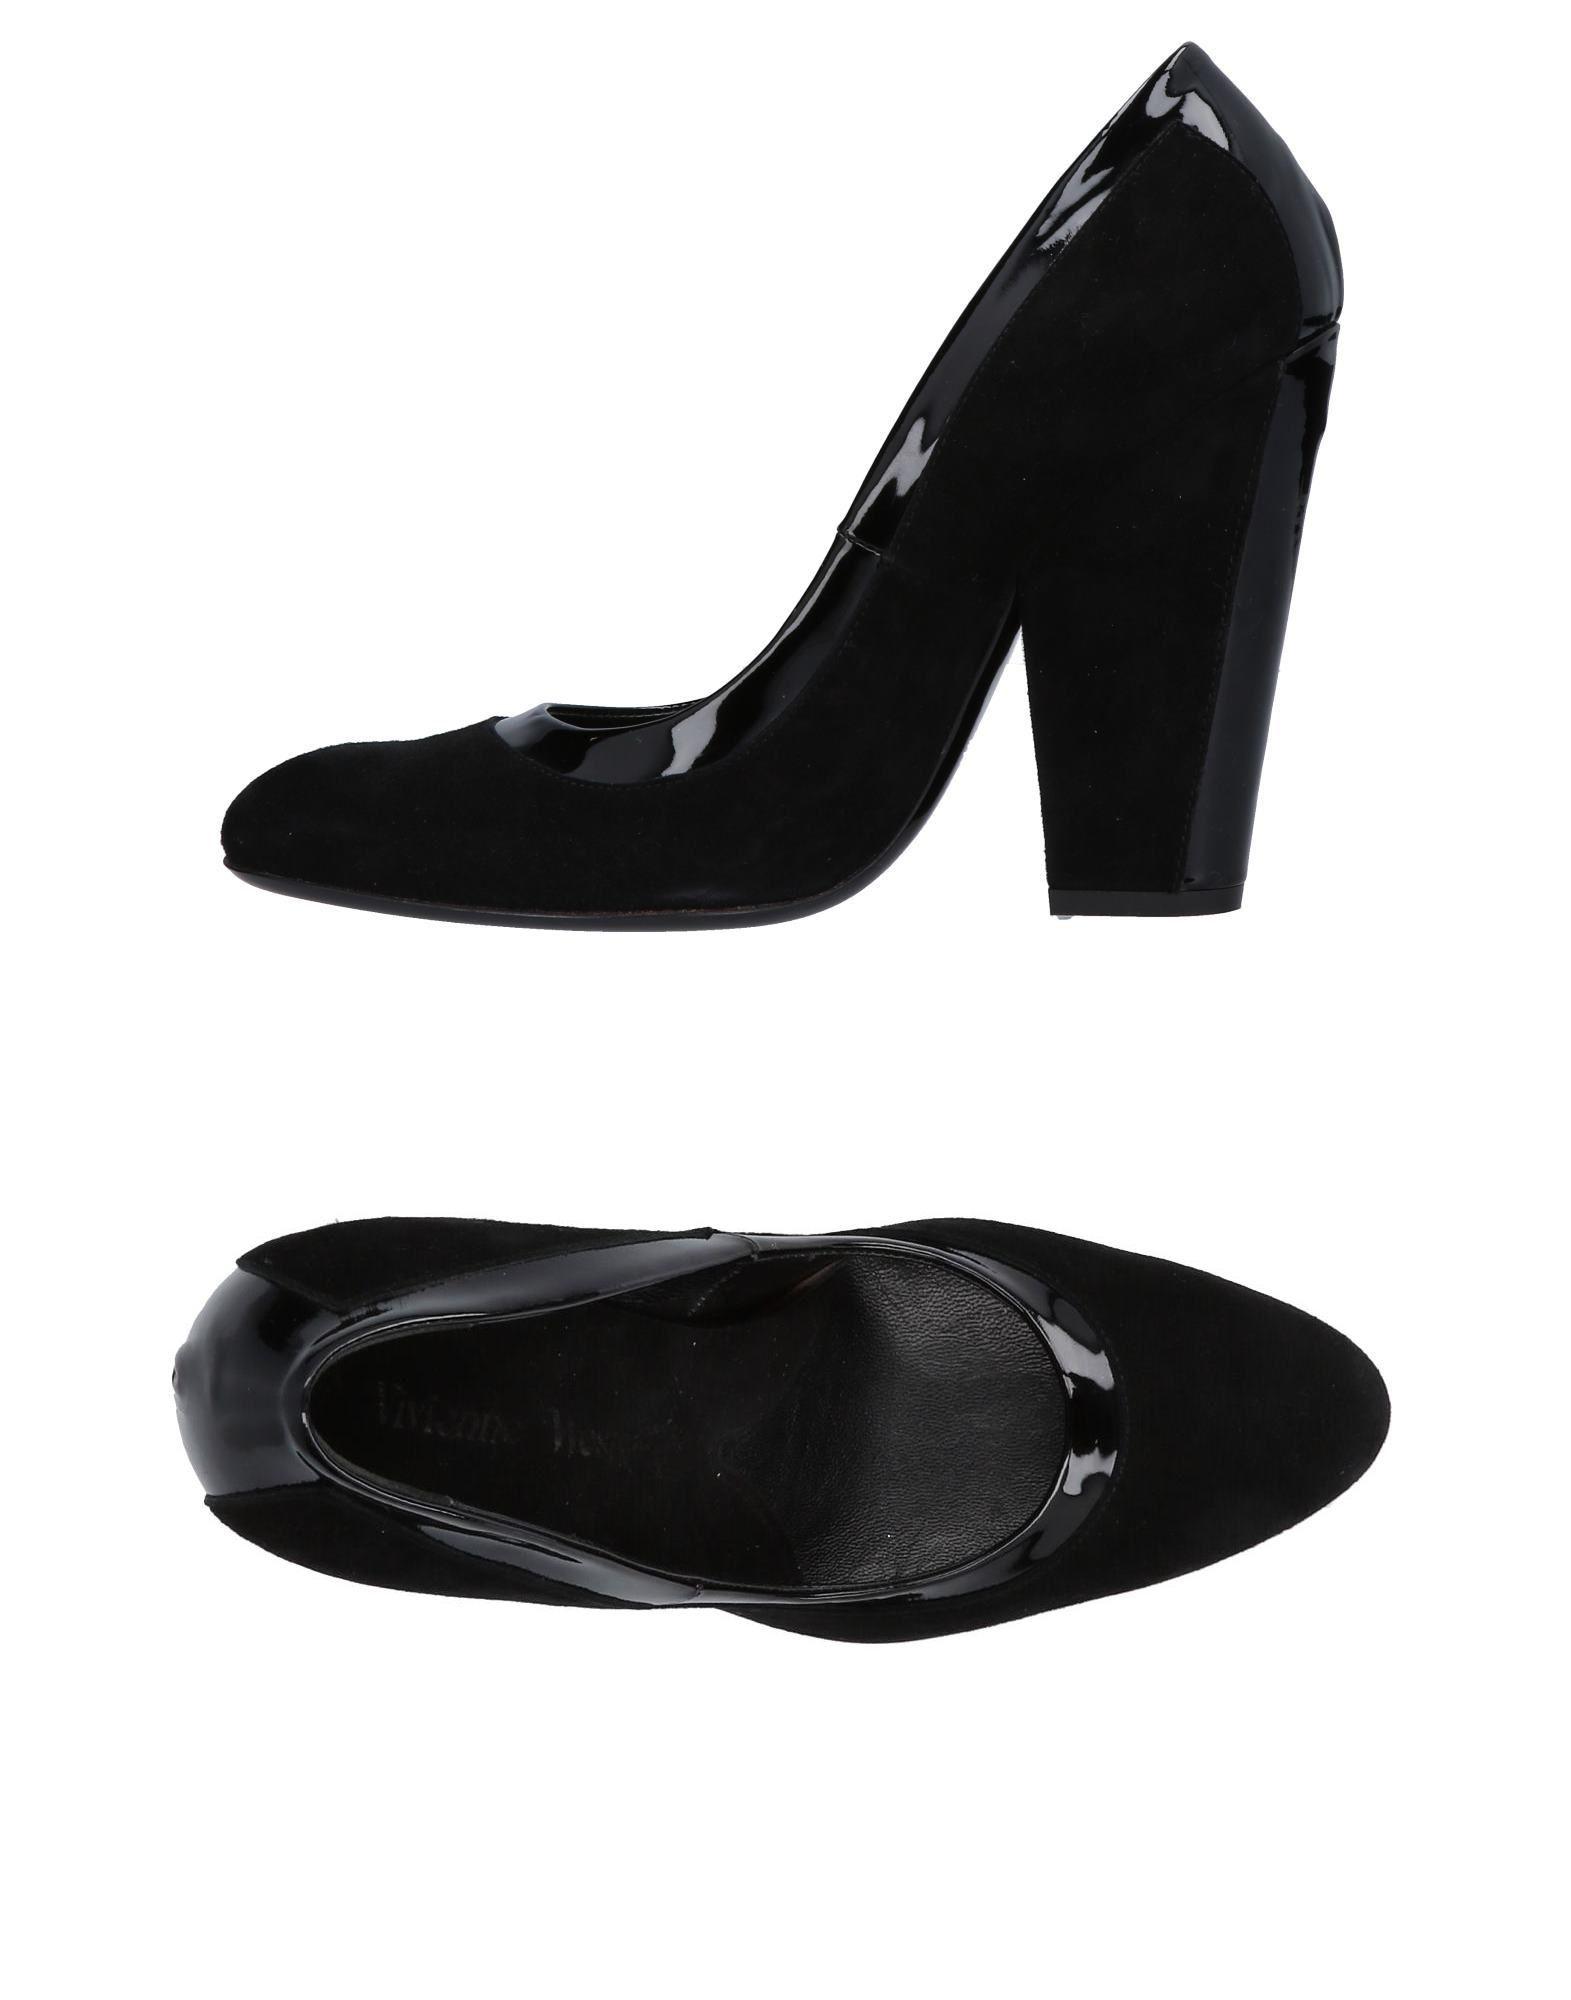 Stilvolle Pumps billige Schuhe Vivienne Westwood Pumps Stilvolle Damen  11485730GJ 41b224